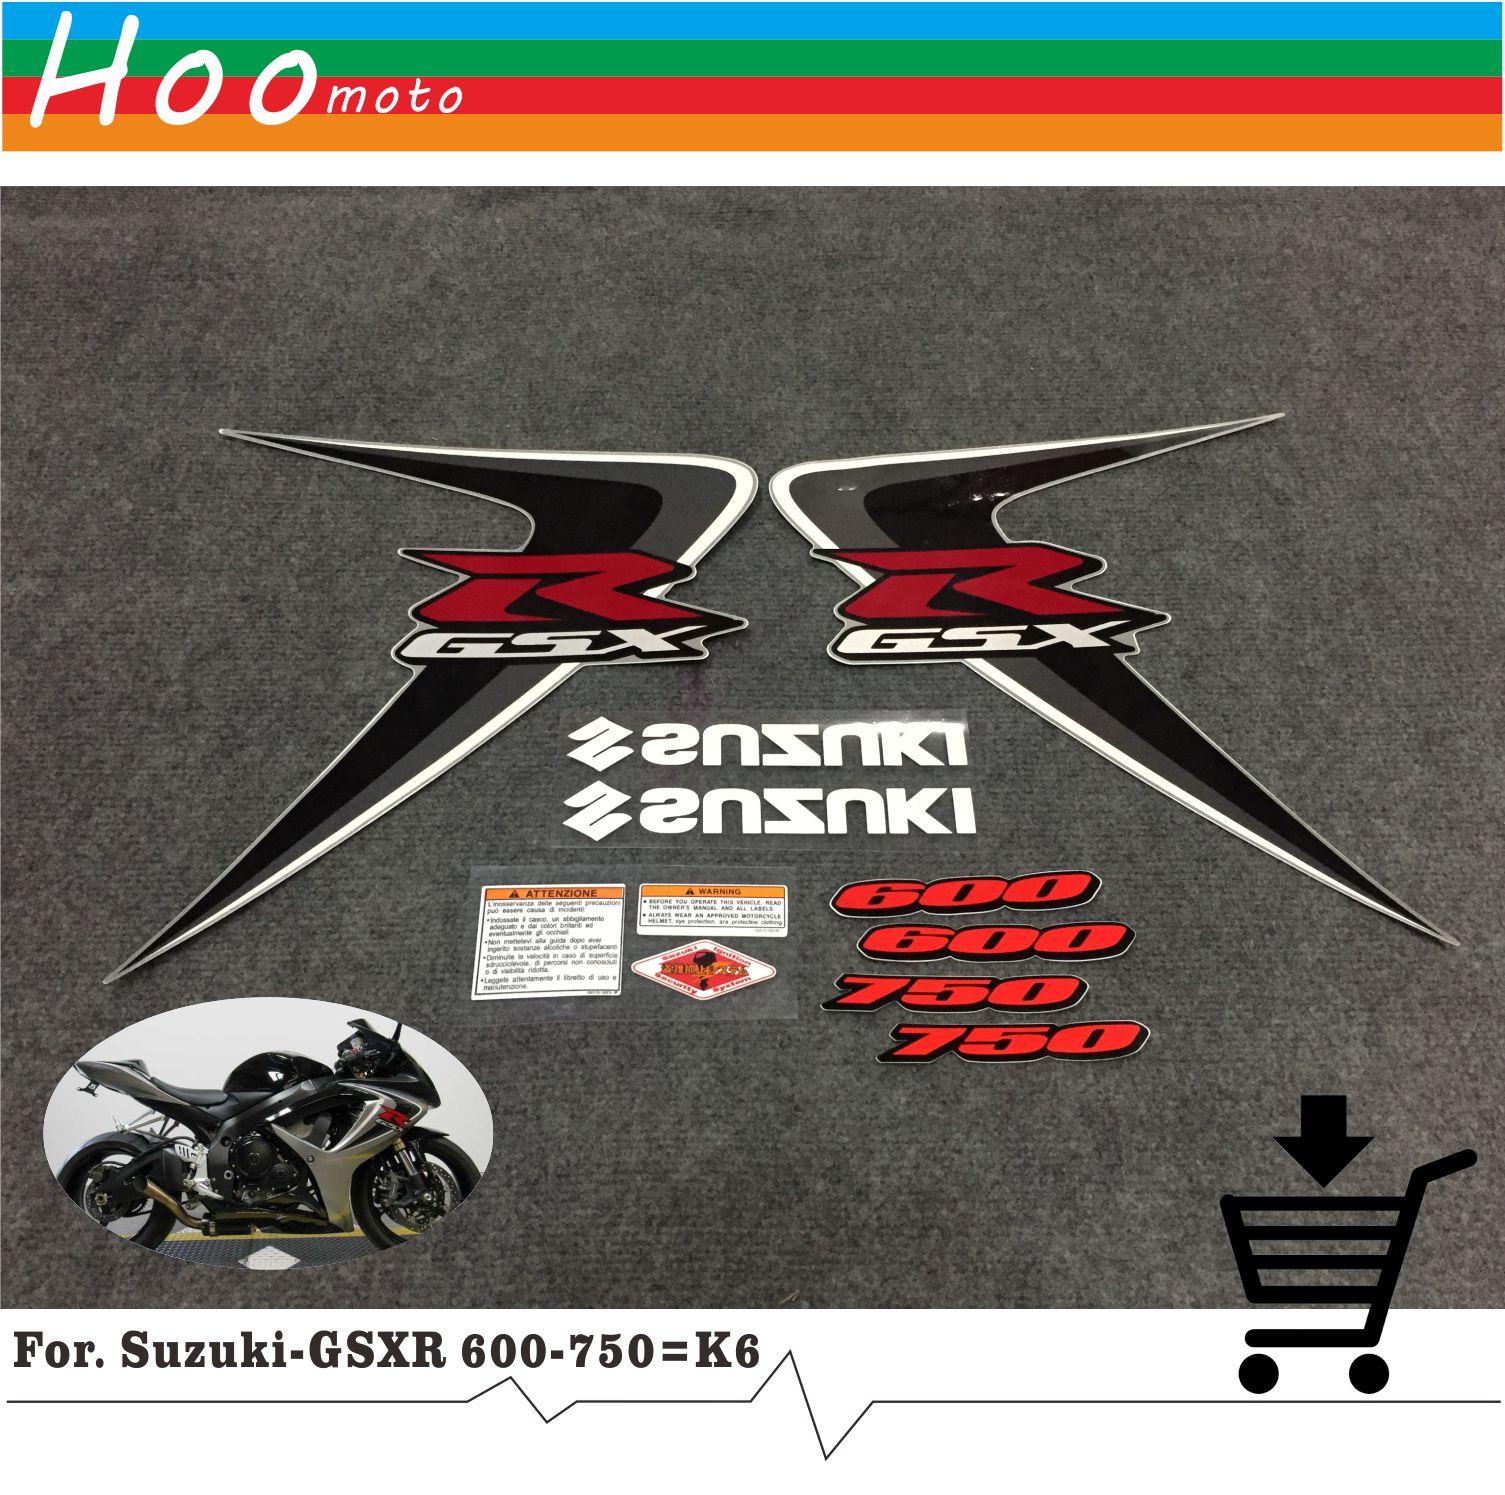 Buy suzuki k8 decals sticker moto and get free shipping on AliExpress.com